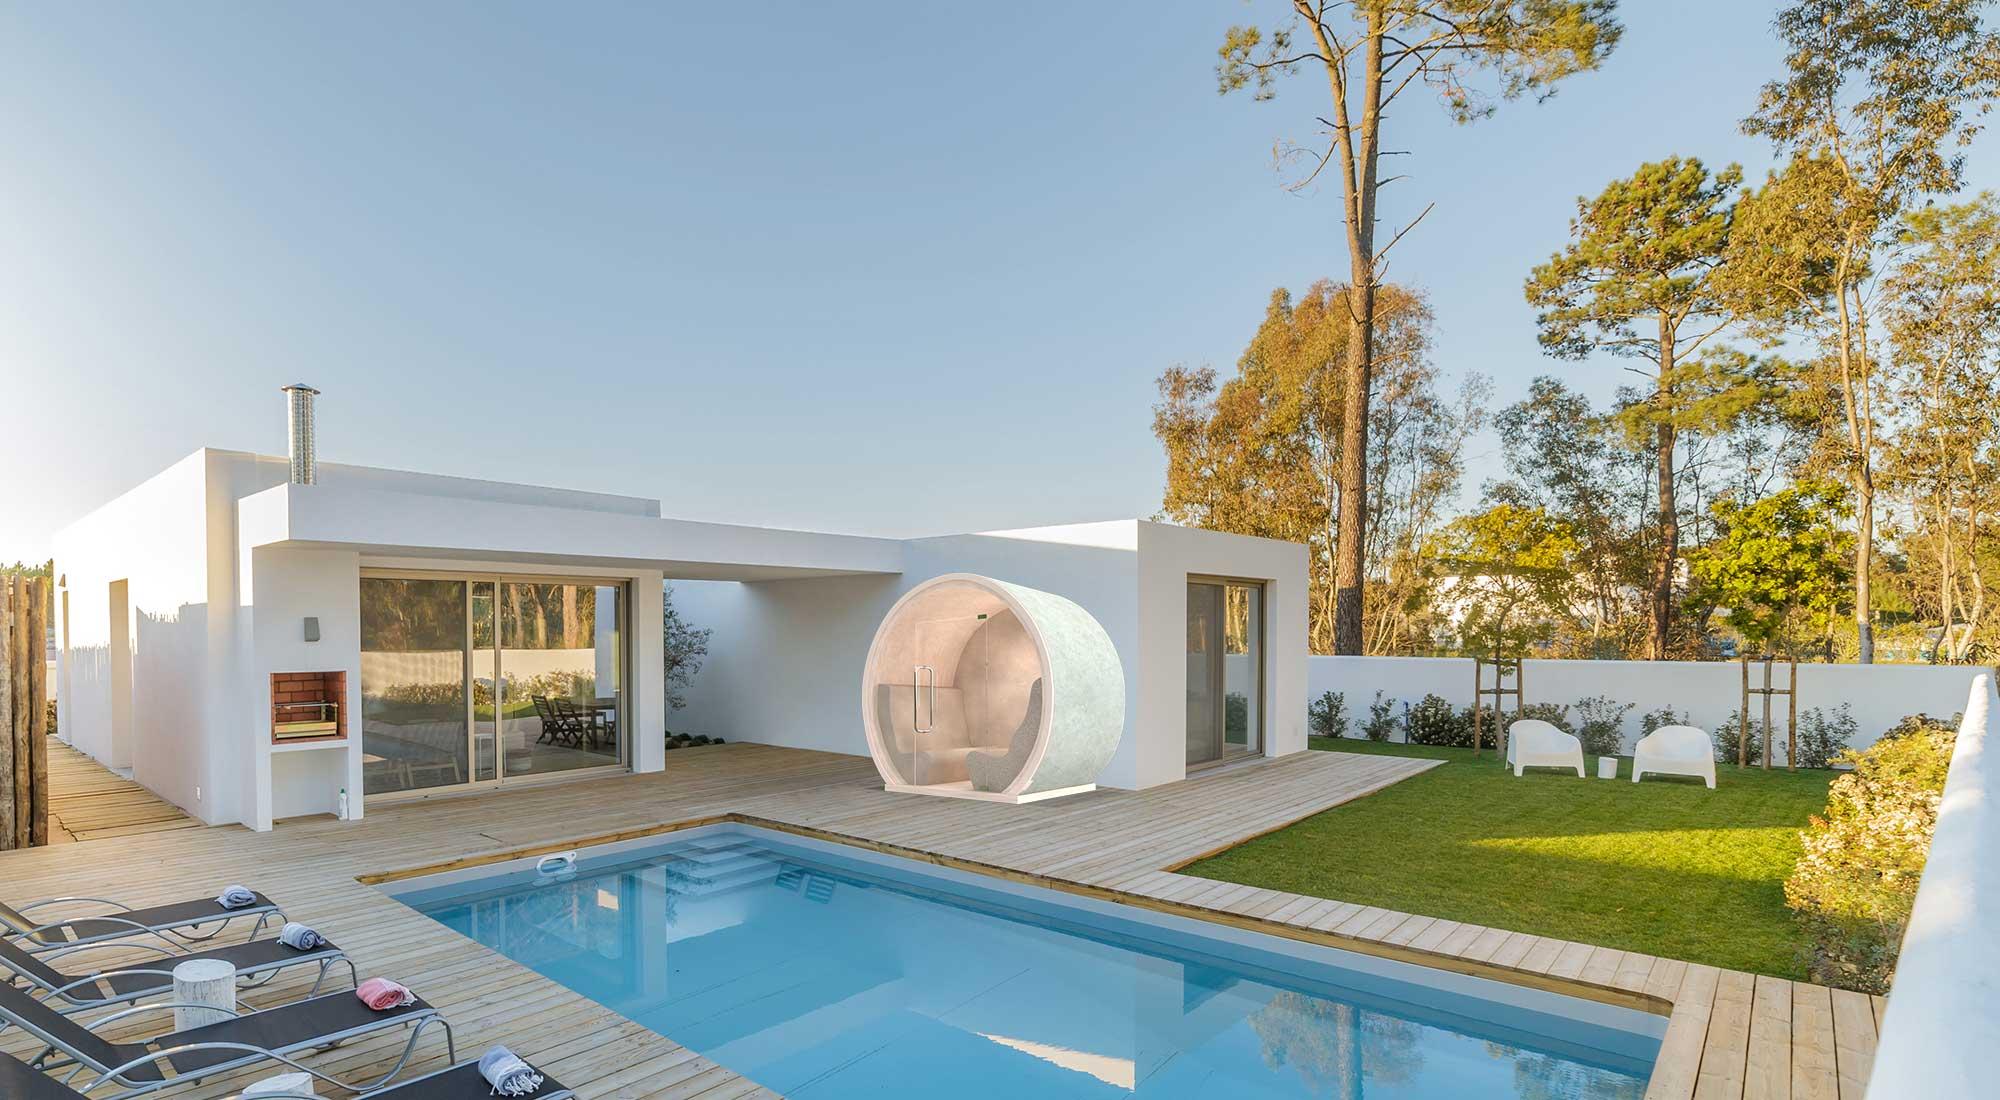 Luksus Rekreacyjne SPA SOLEUM – Kabina z Morskim Klimatem